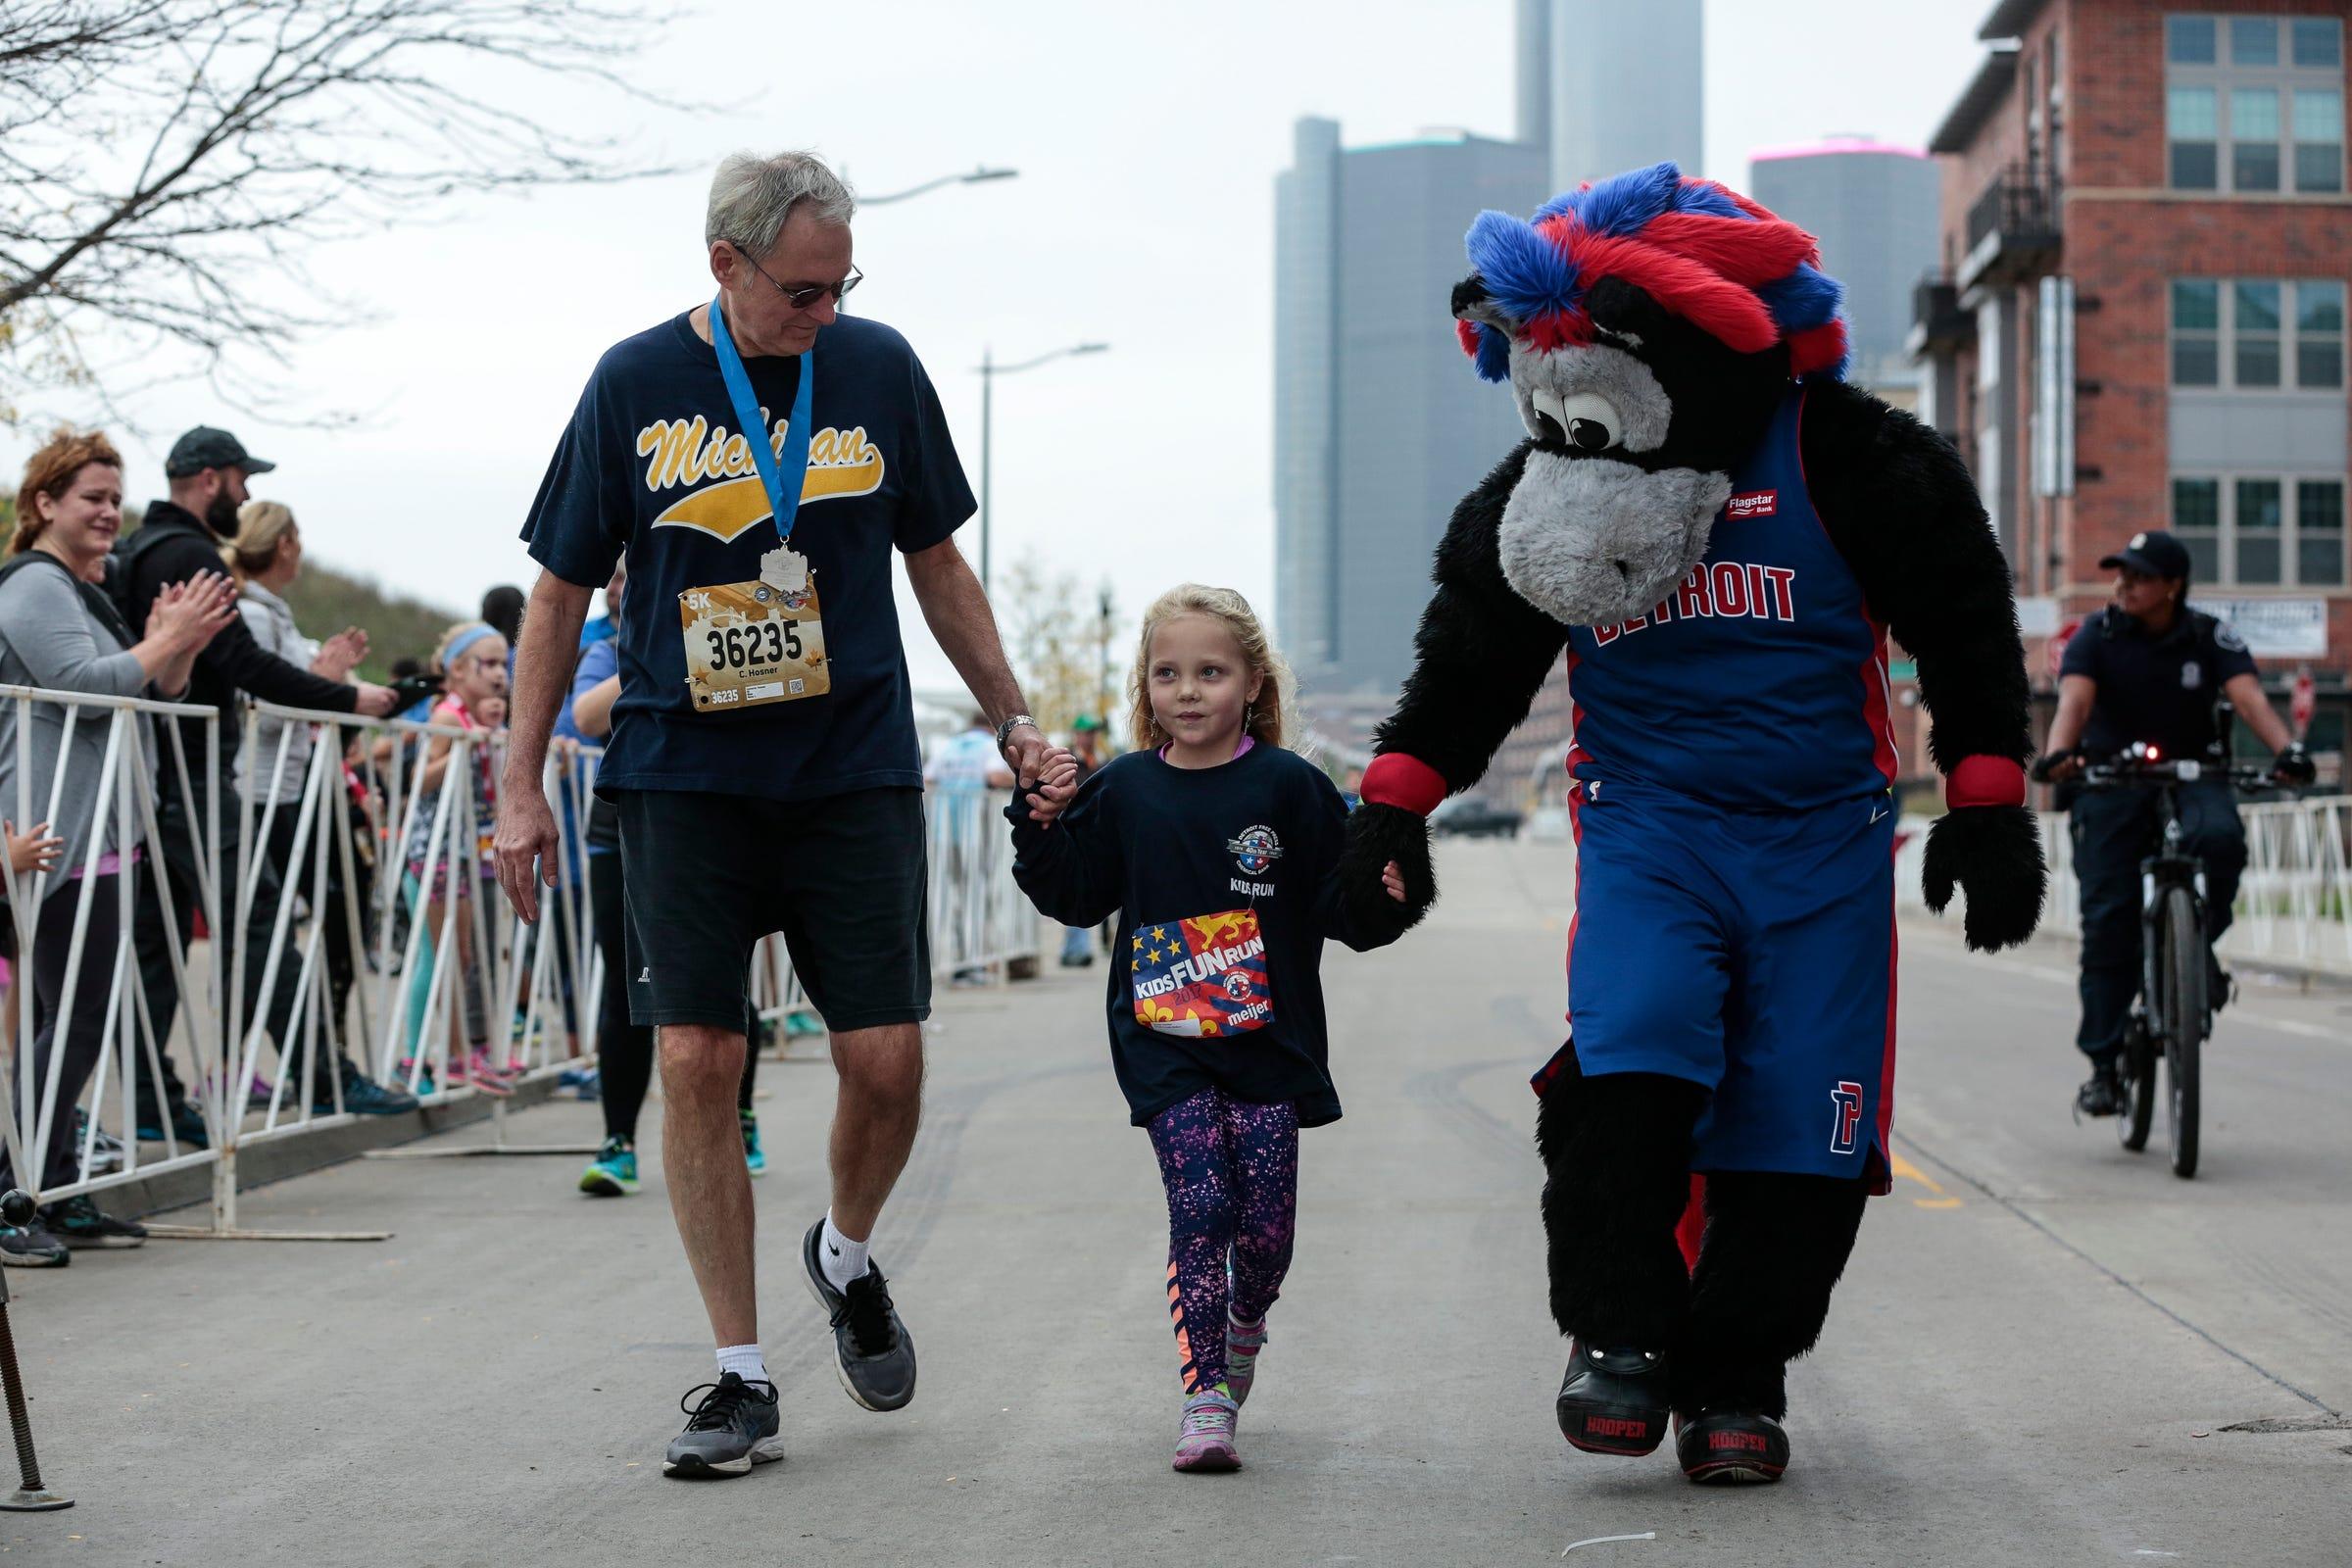 http://www freep com/picture-gallery/sports/marathon/2017/10